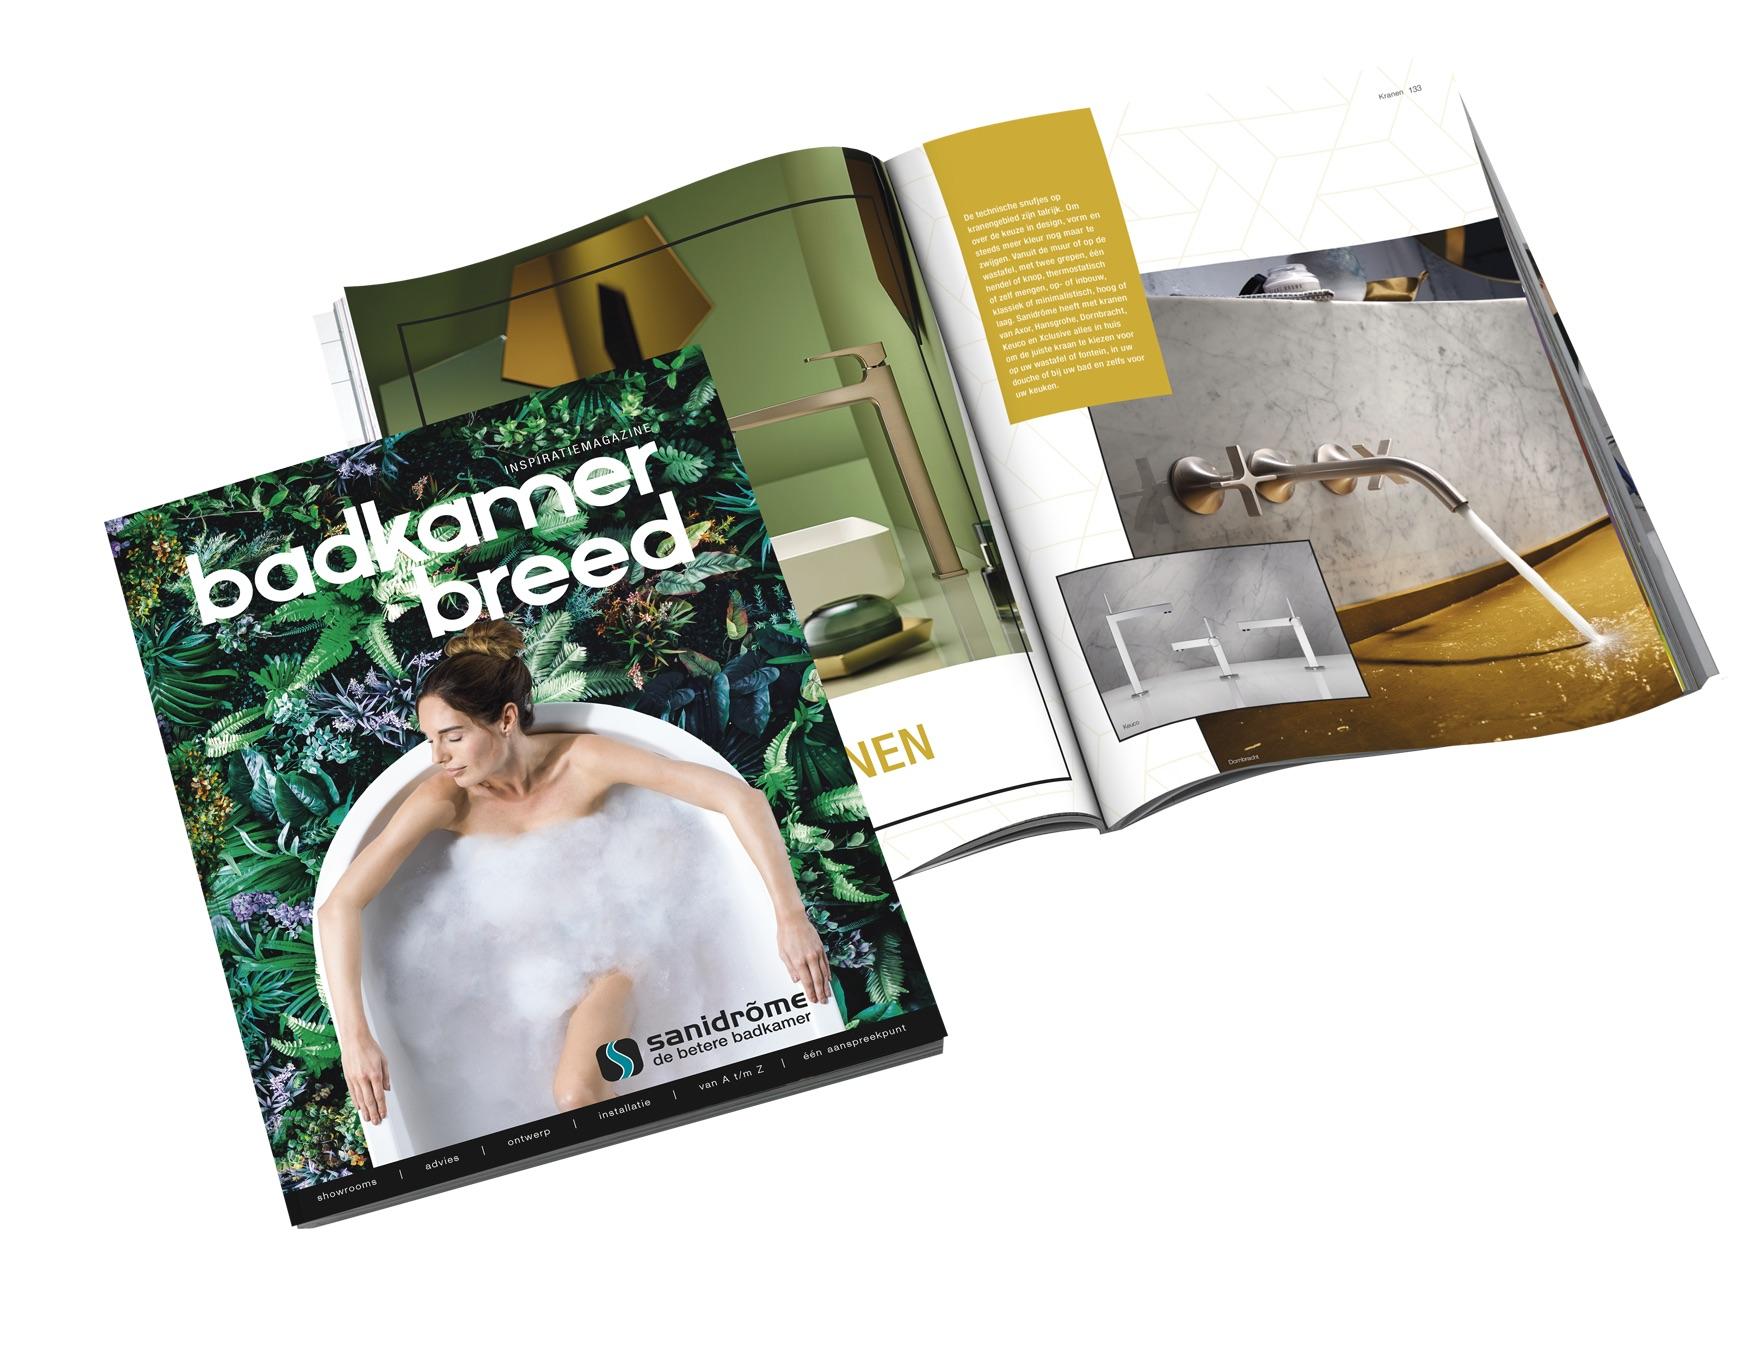 Badkamerbreed inspiratiemagazine Sanidrome